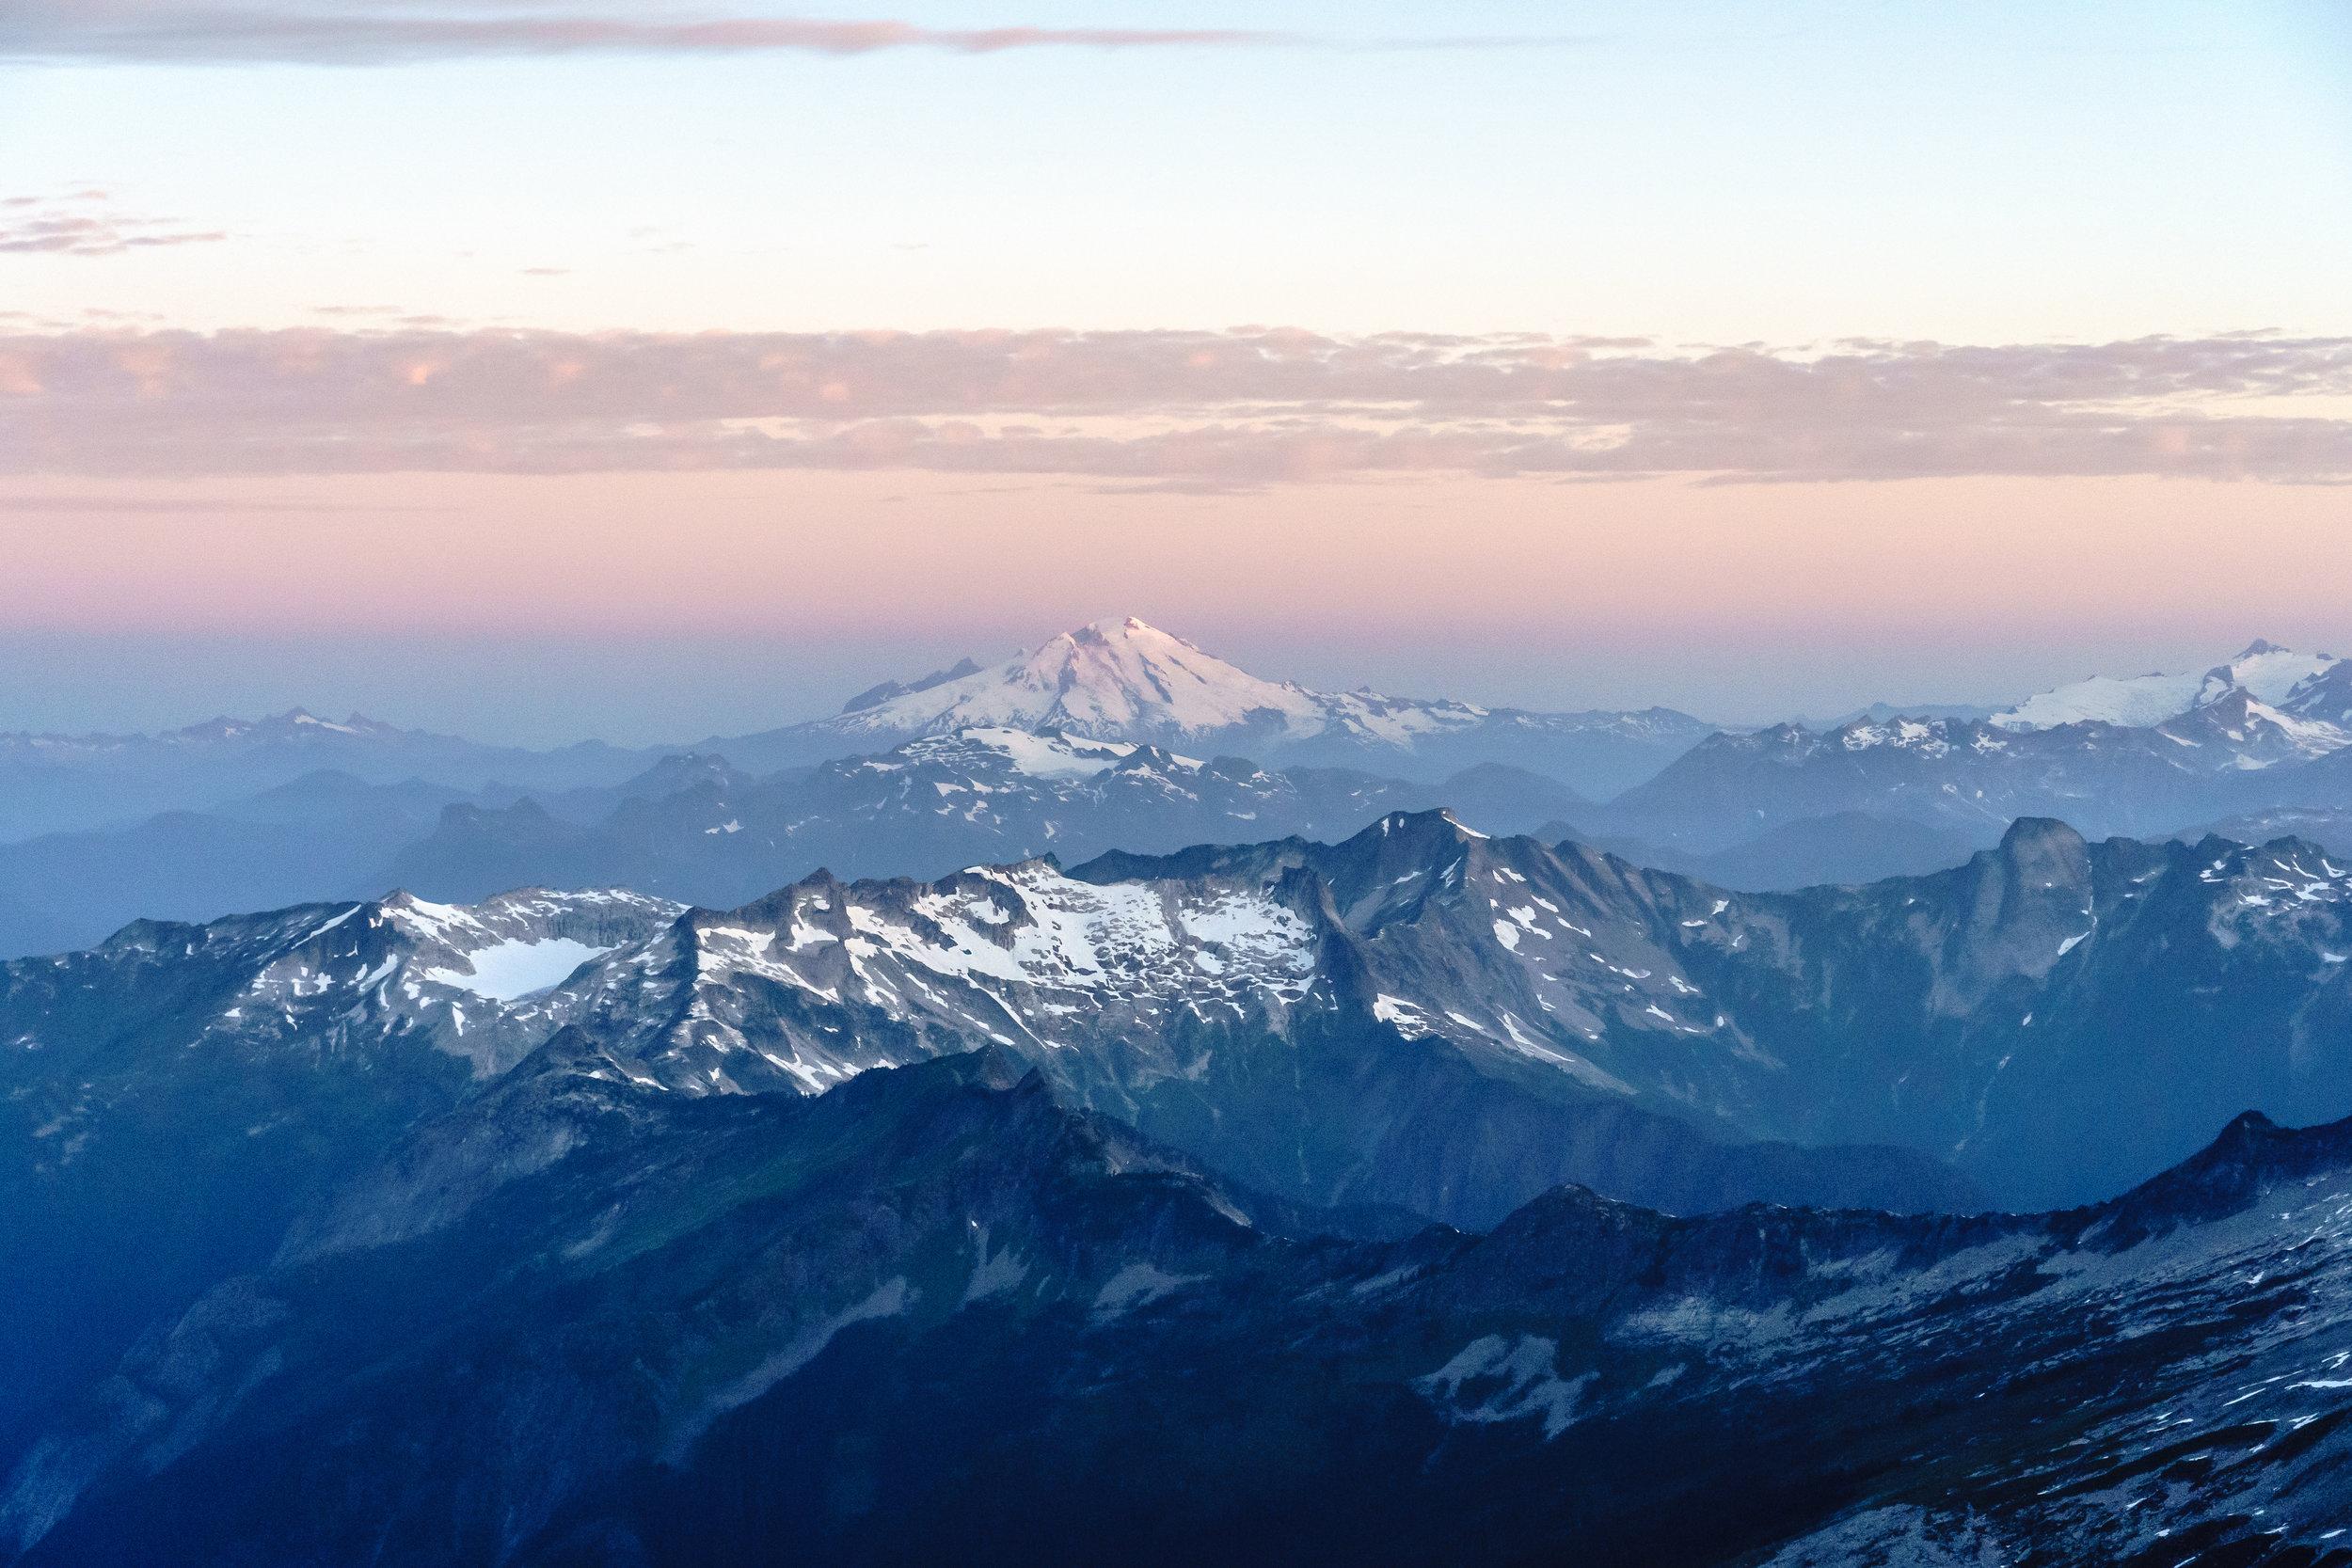 Mt. Baker alpenglow